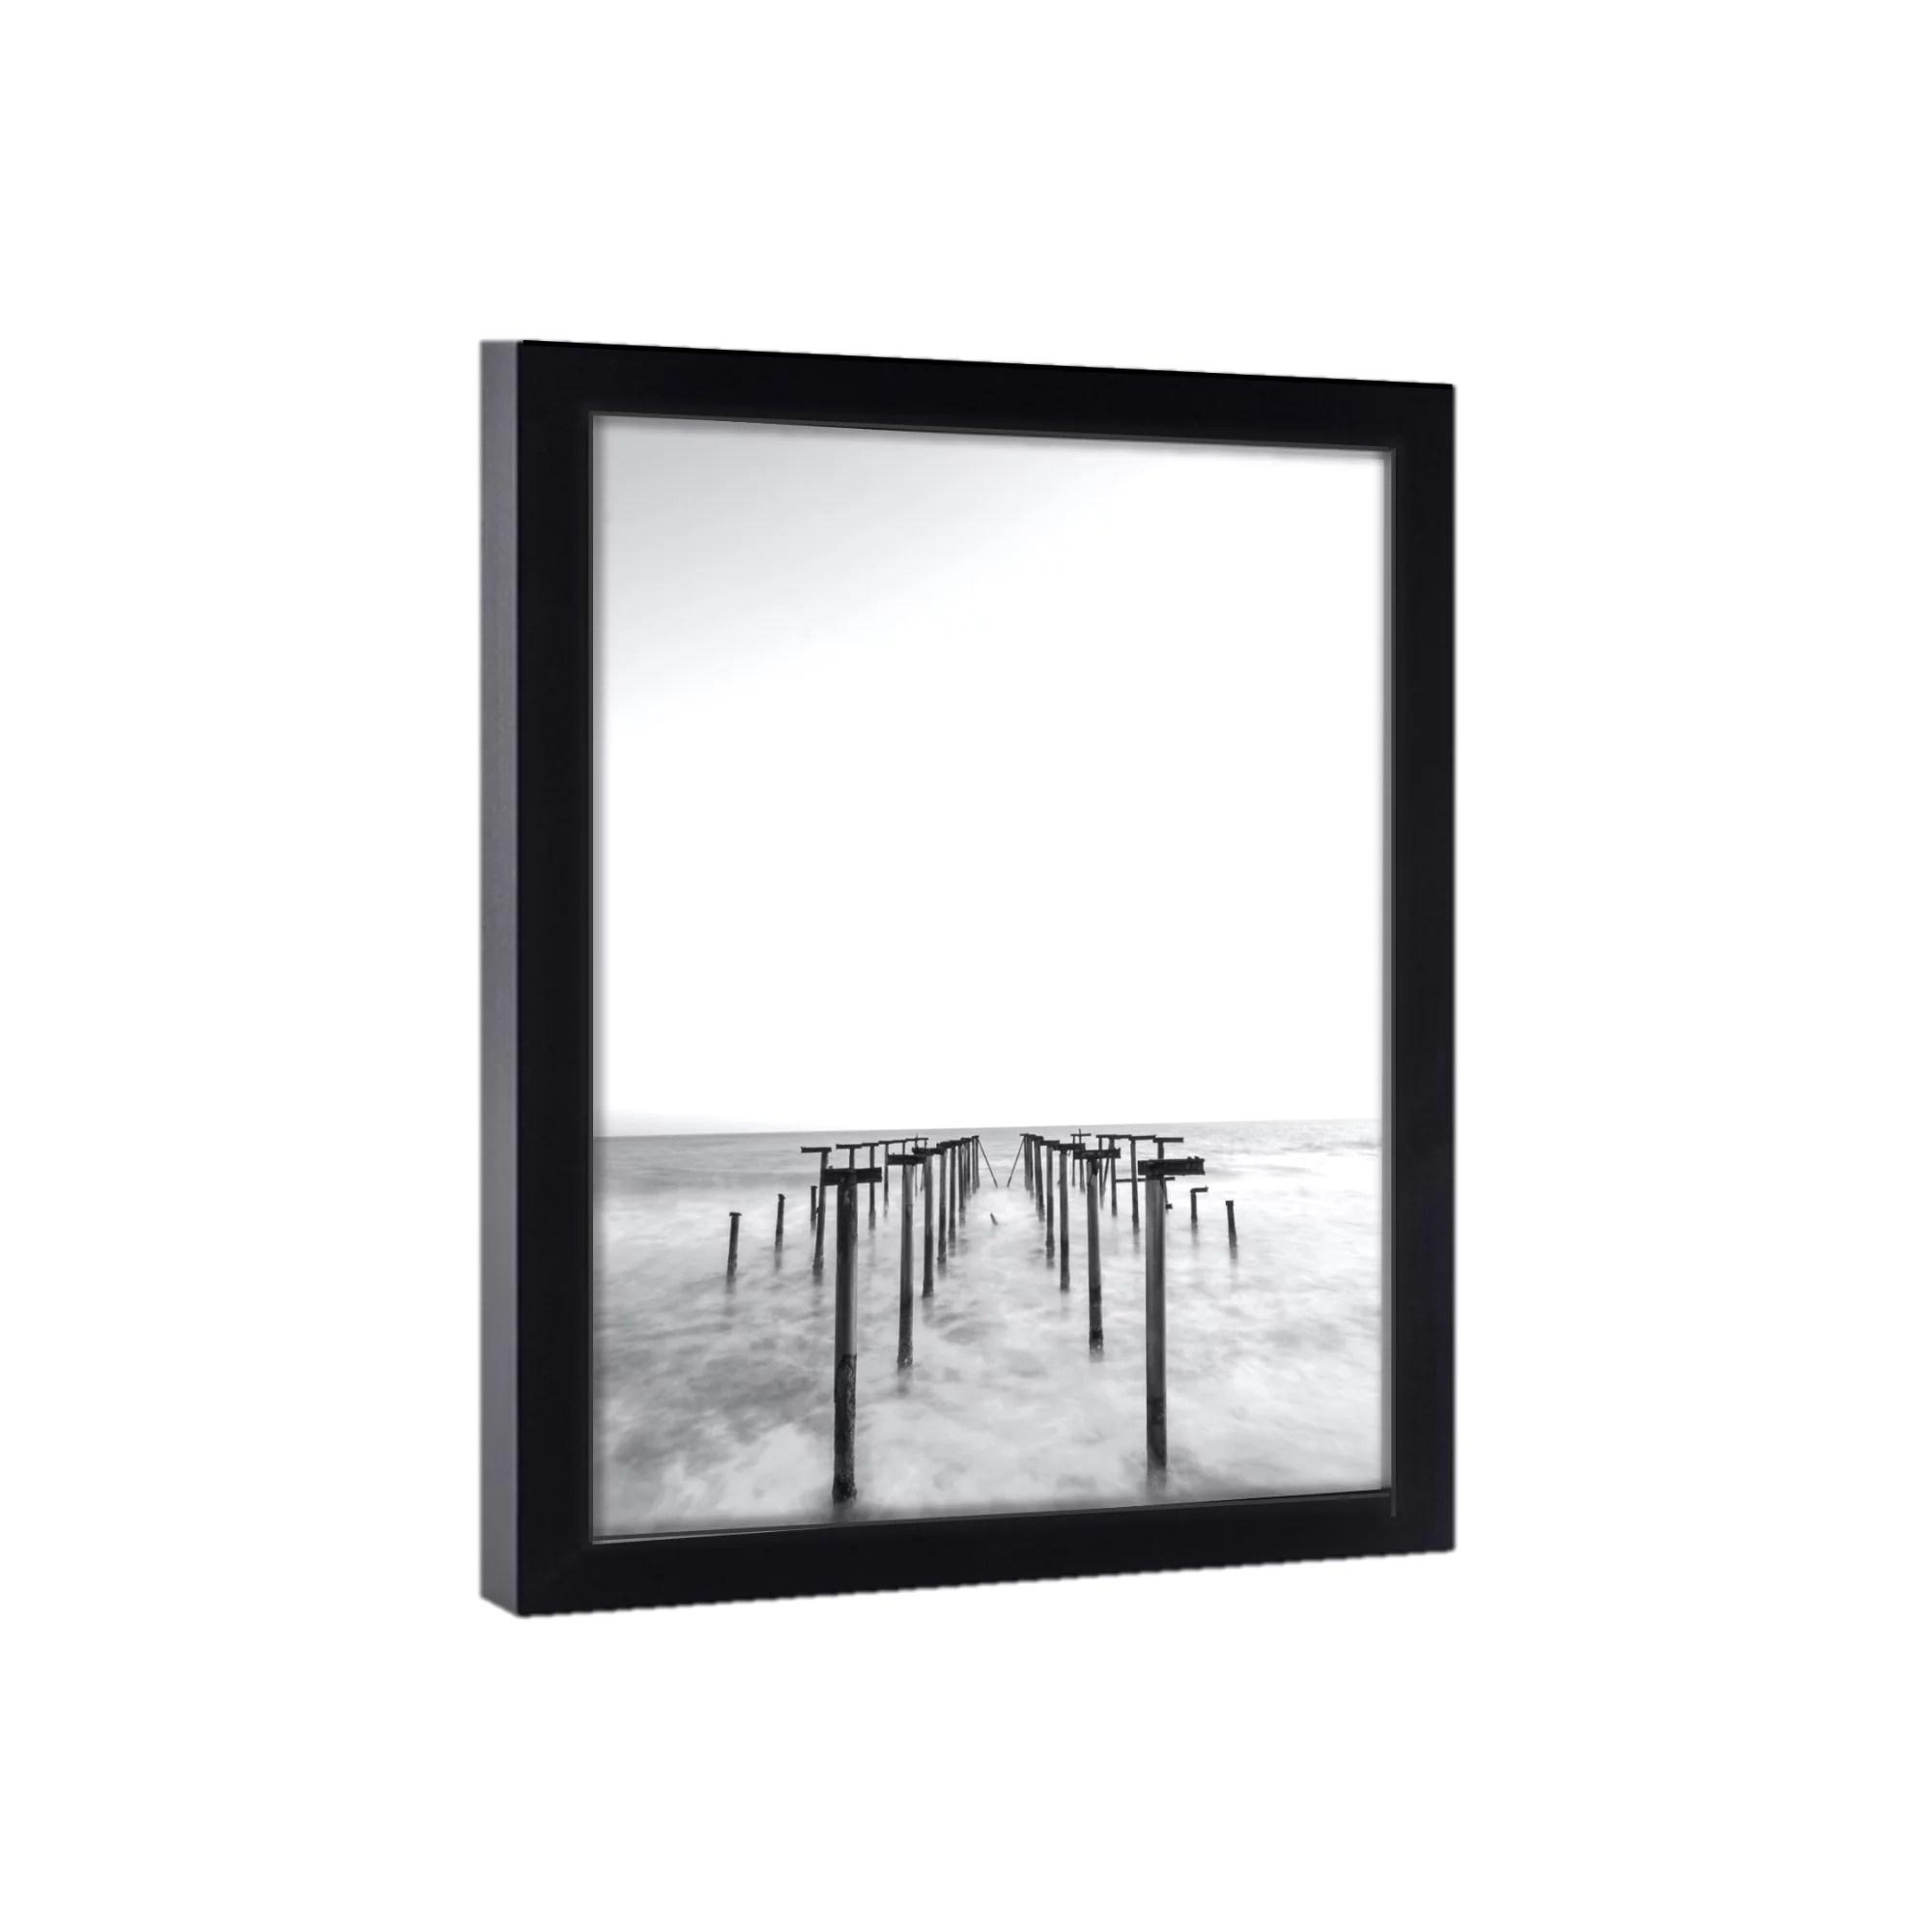 17x24 picture frame black 17x24 frame 17 x 24 poster frames 17 x 24